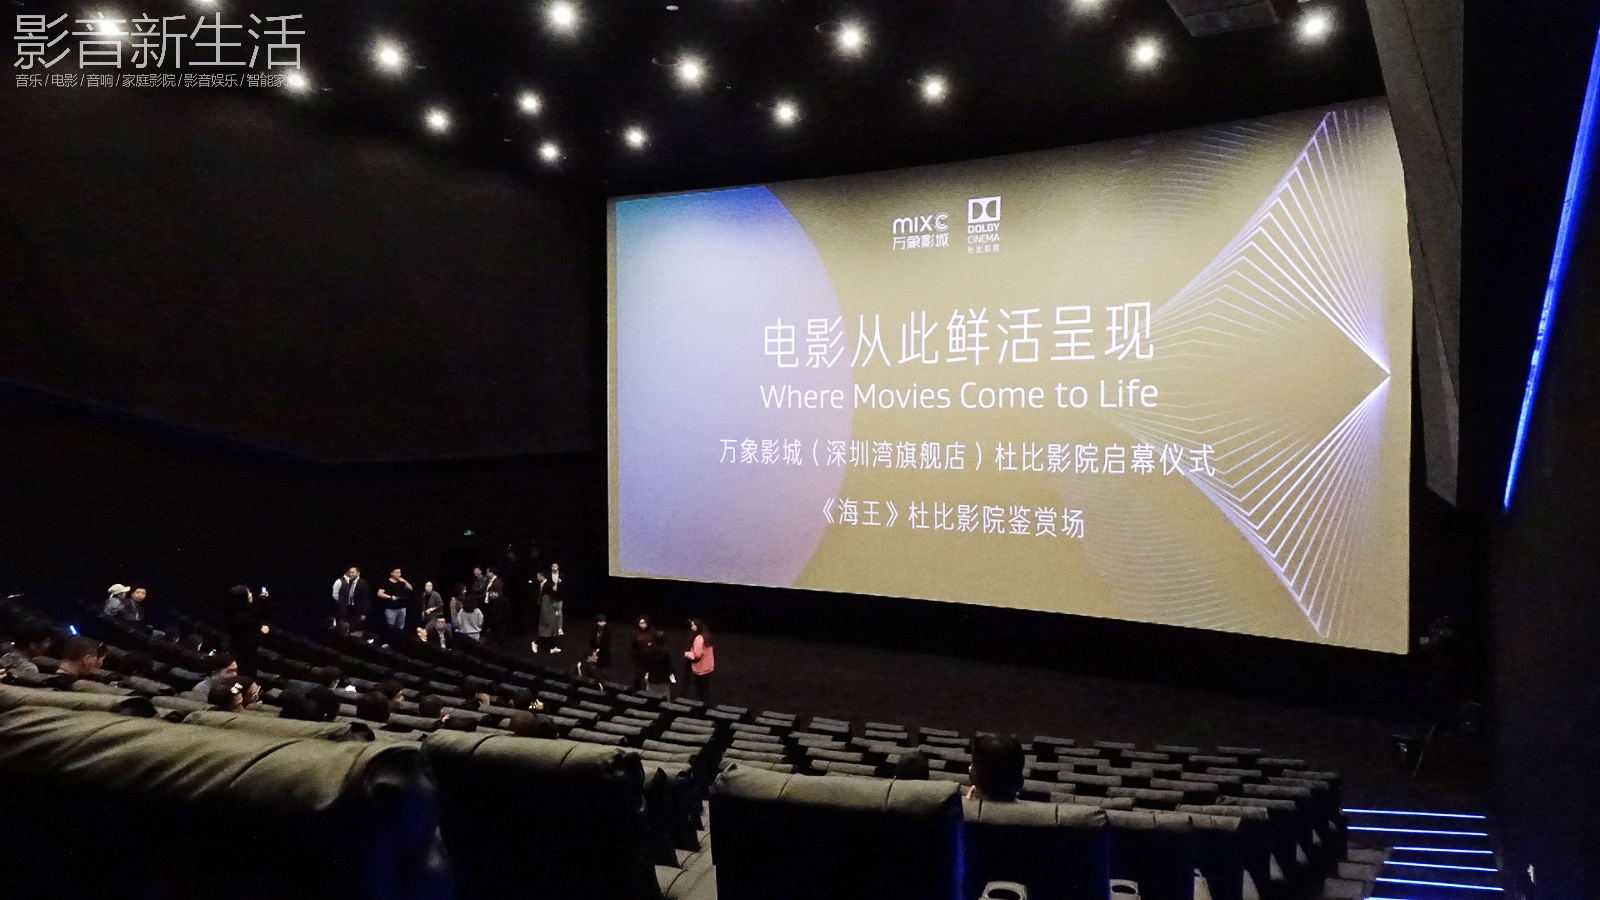 "DOLBY CINEMA SHENZHEN ATMOS DOLBYVISION 9 - 现场   ""影院界的全新标杆"" 深圳首家Dolby Cinema杜比影院落户深圳湾万象城"